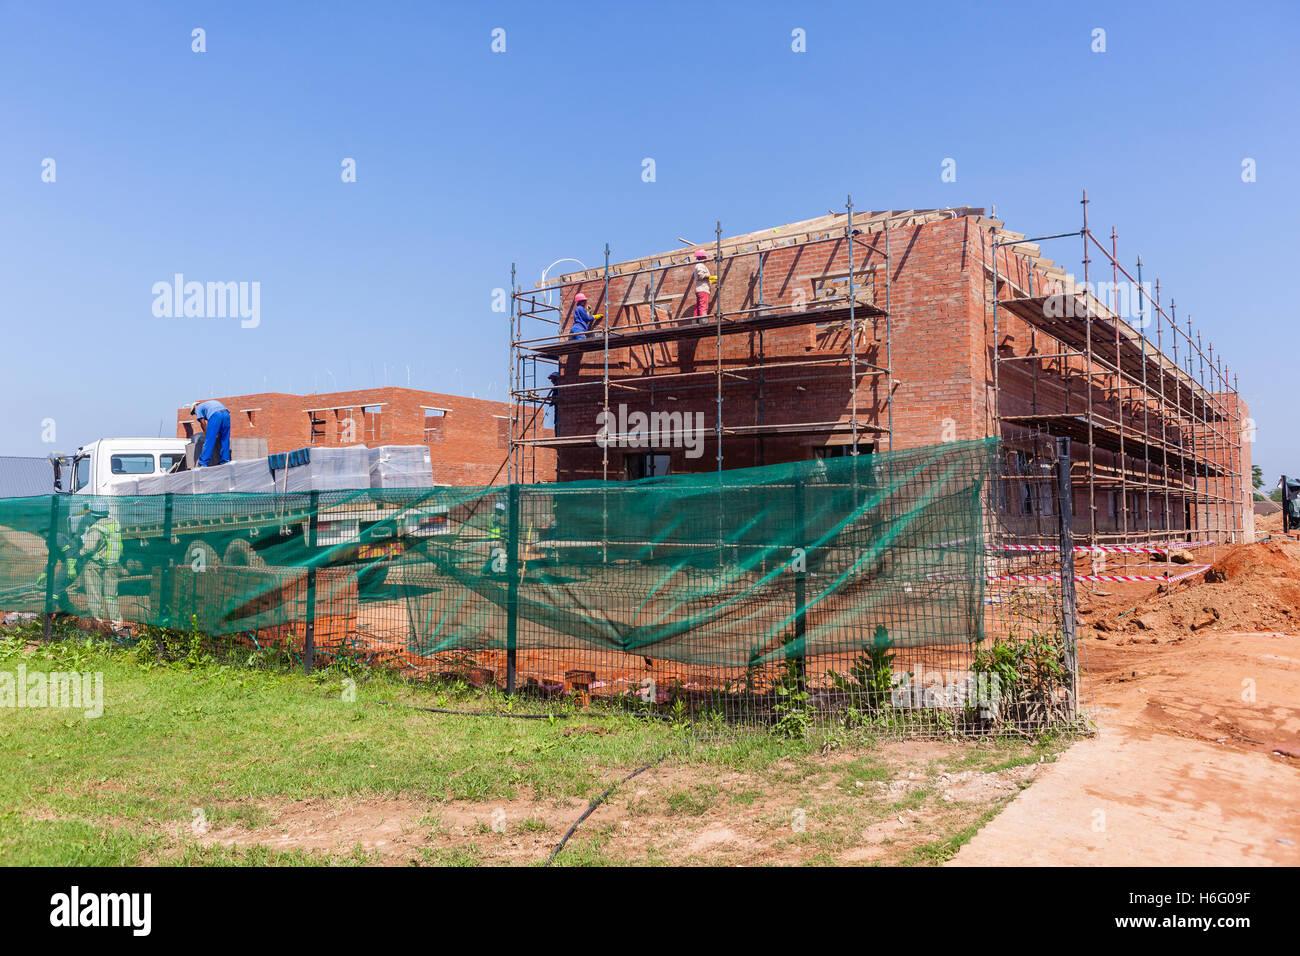 Building construction halfway  photo progress of brick work roof structures. - Stock Image